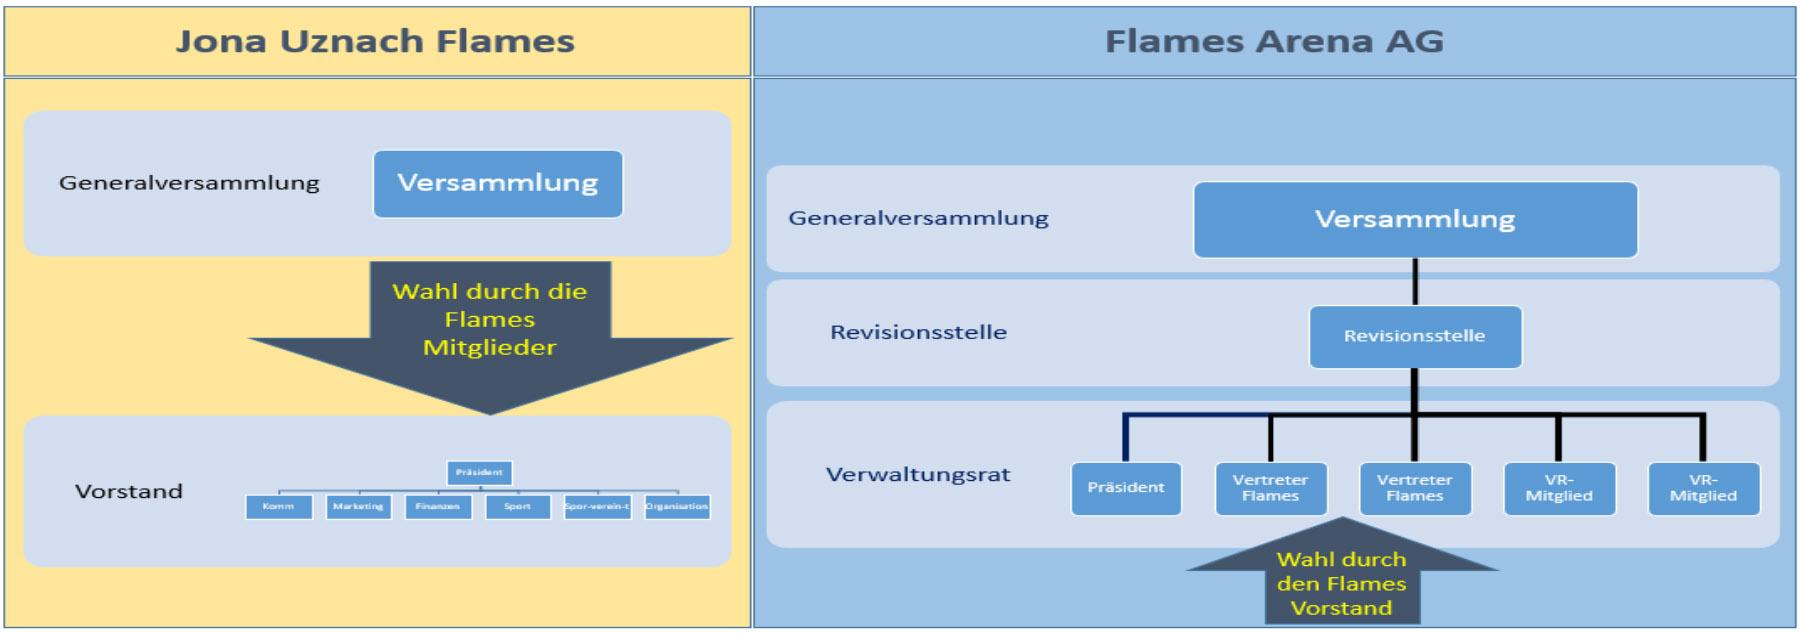 Flames-Arena Organisation